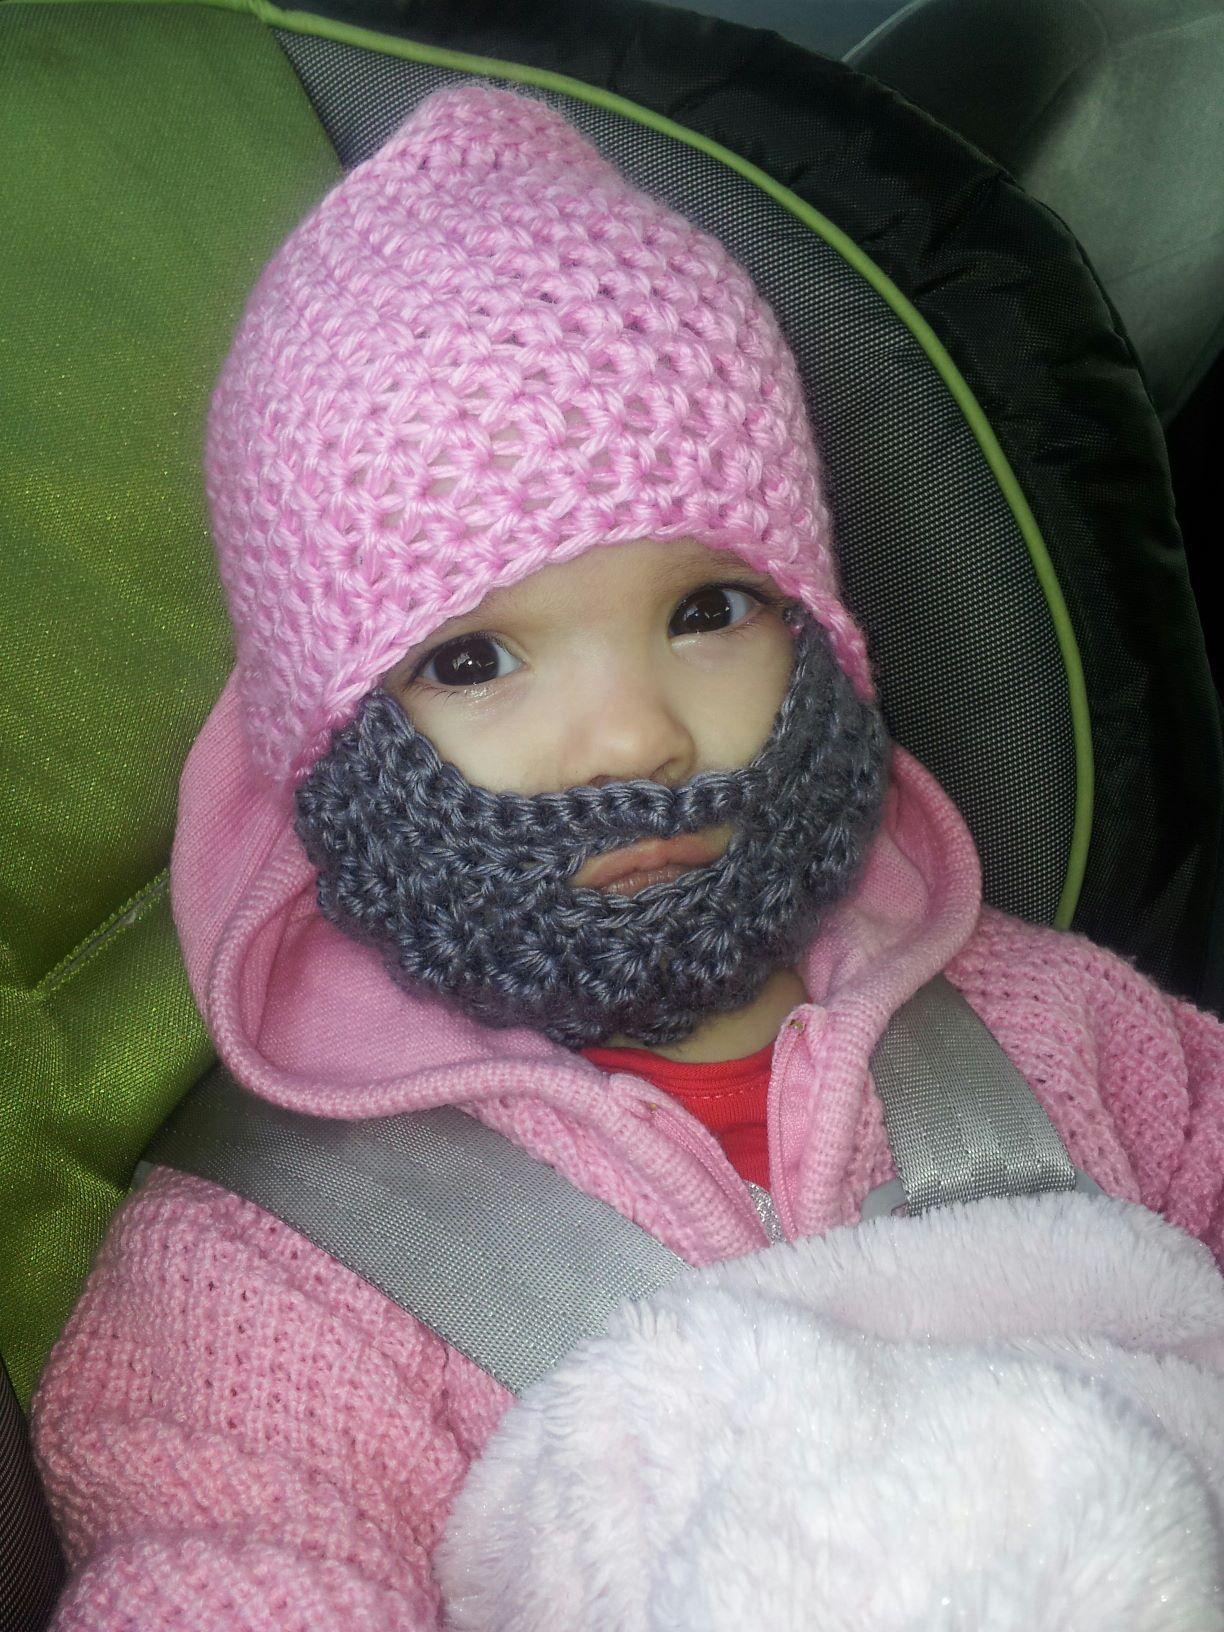 Crochet Pattern For Baby Hat With Beard : Crochet baby beard hat Knitting & Crocheting Pinterest